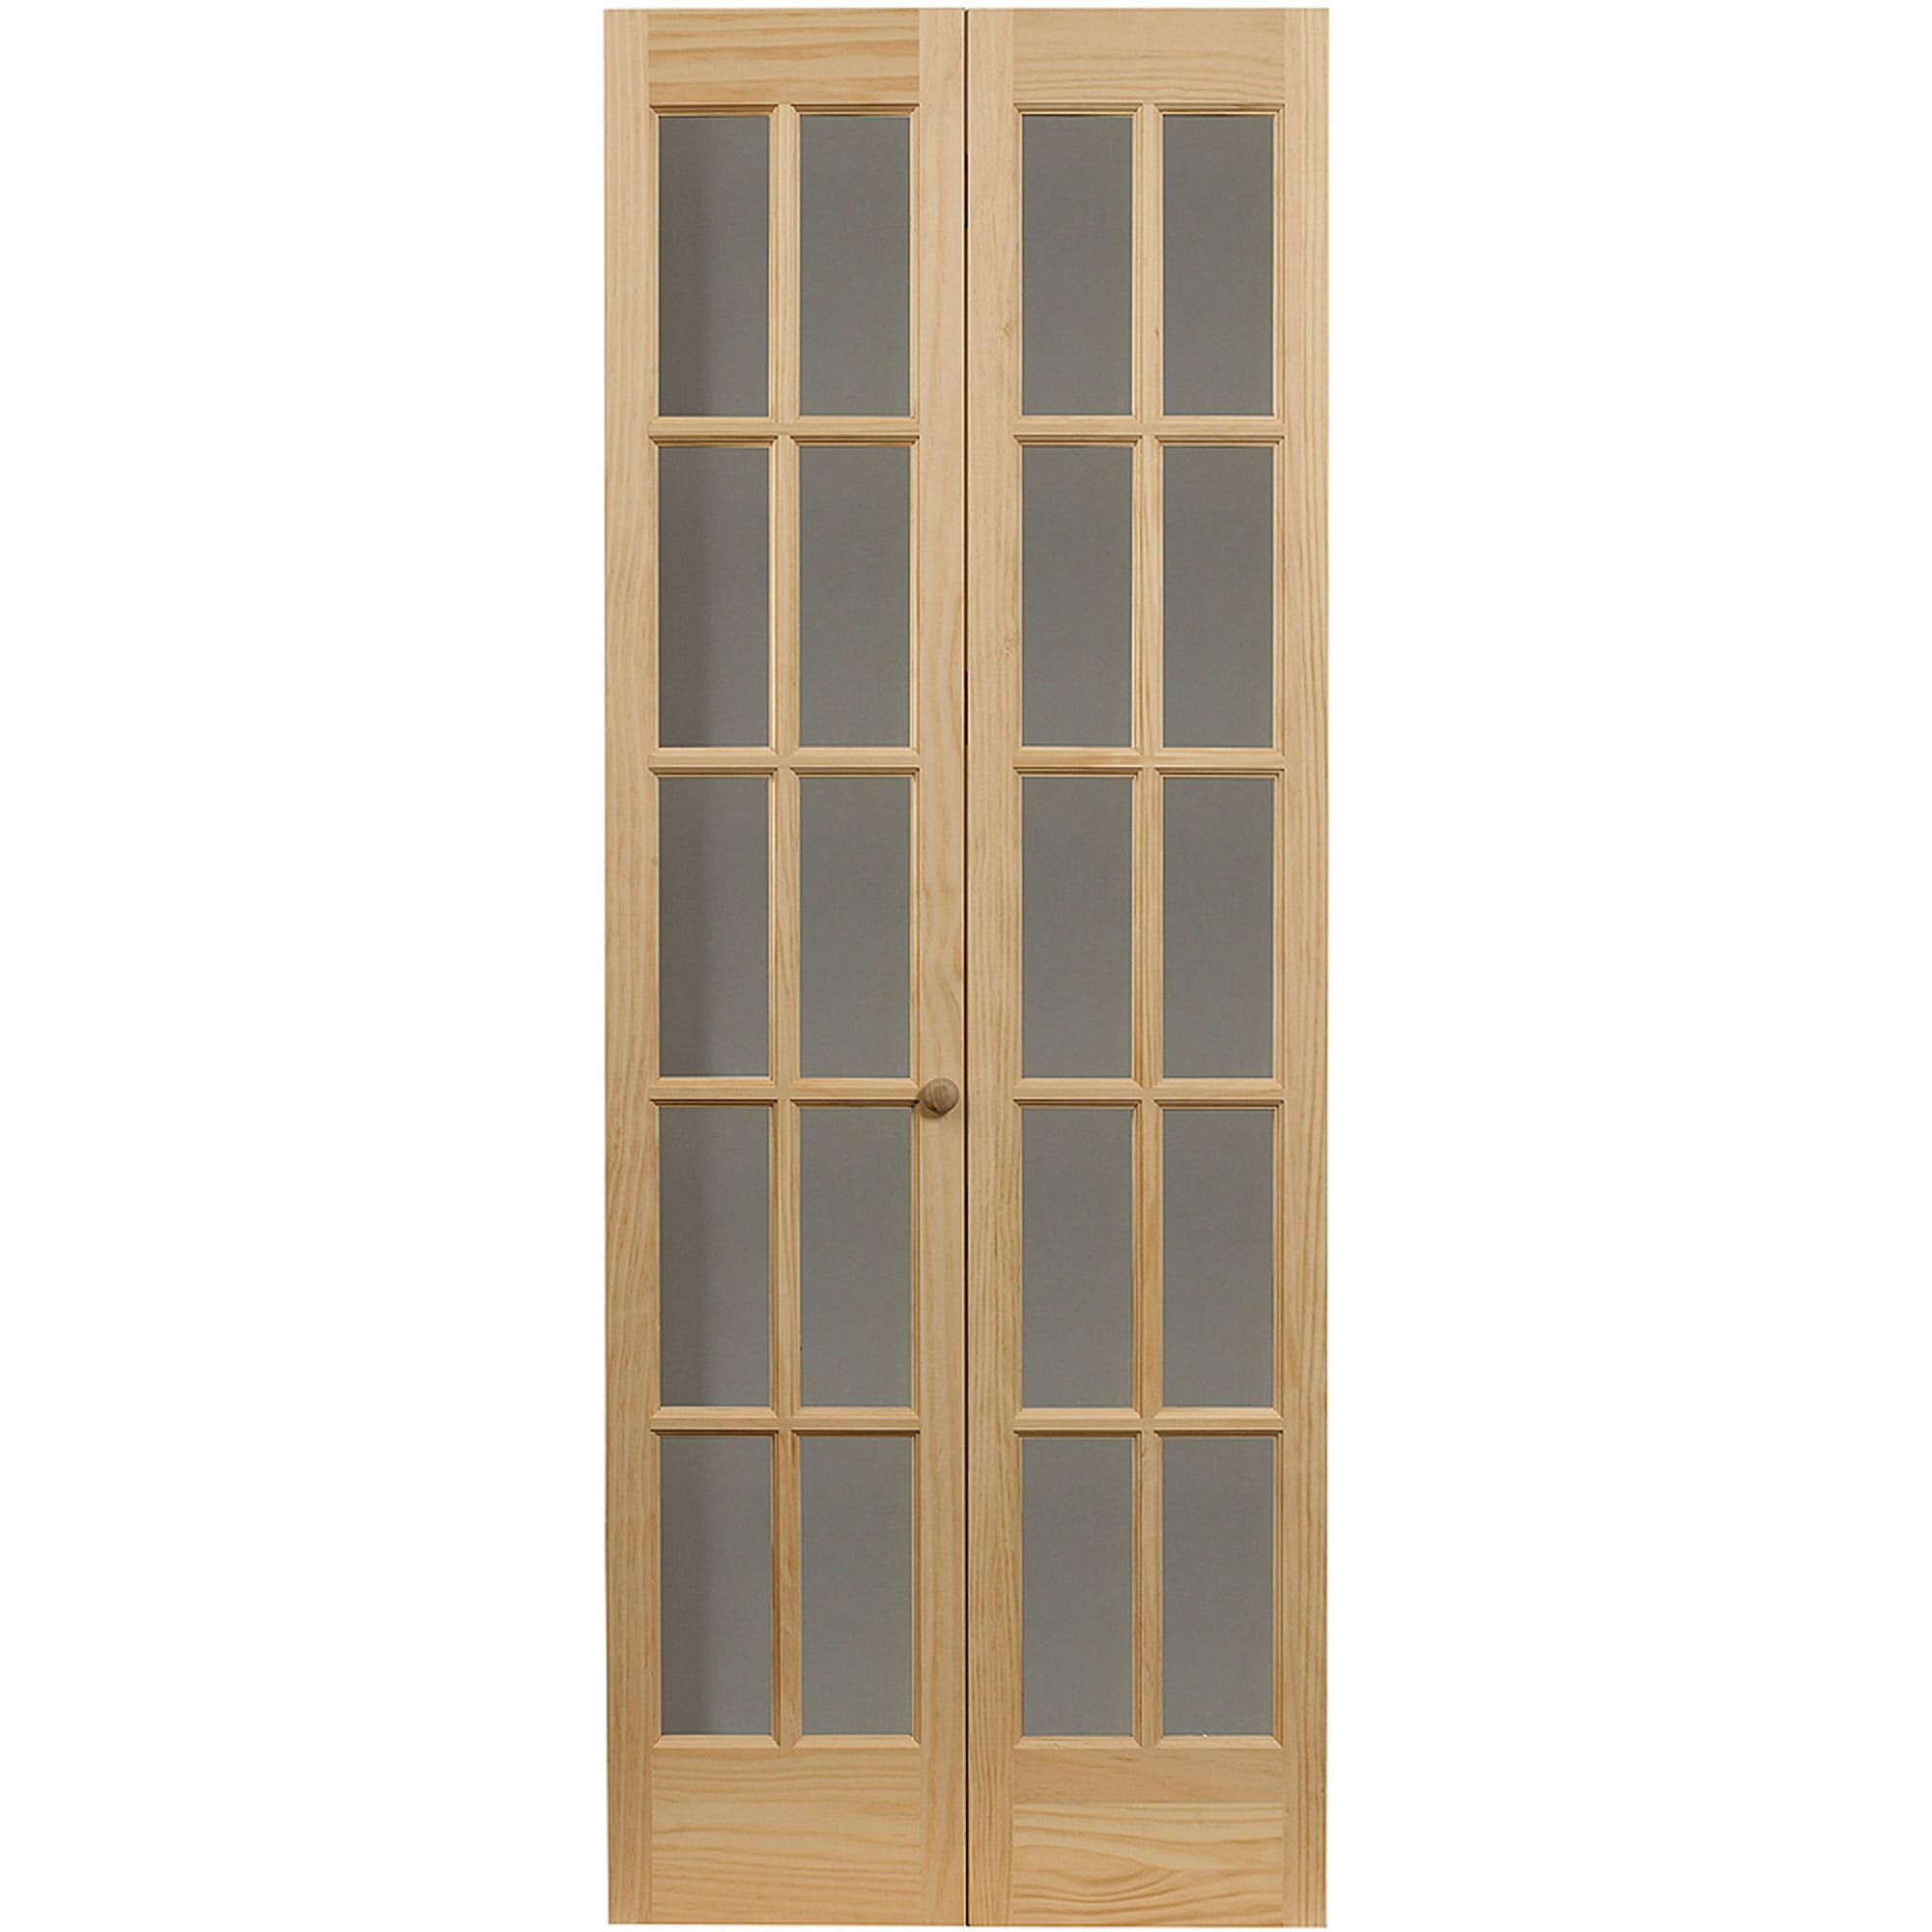 "AWC Traditional Divided Light Glass 30"" x 80.5"" Bifold Door"